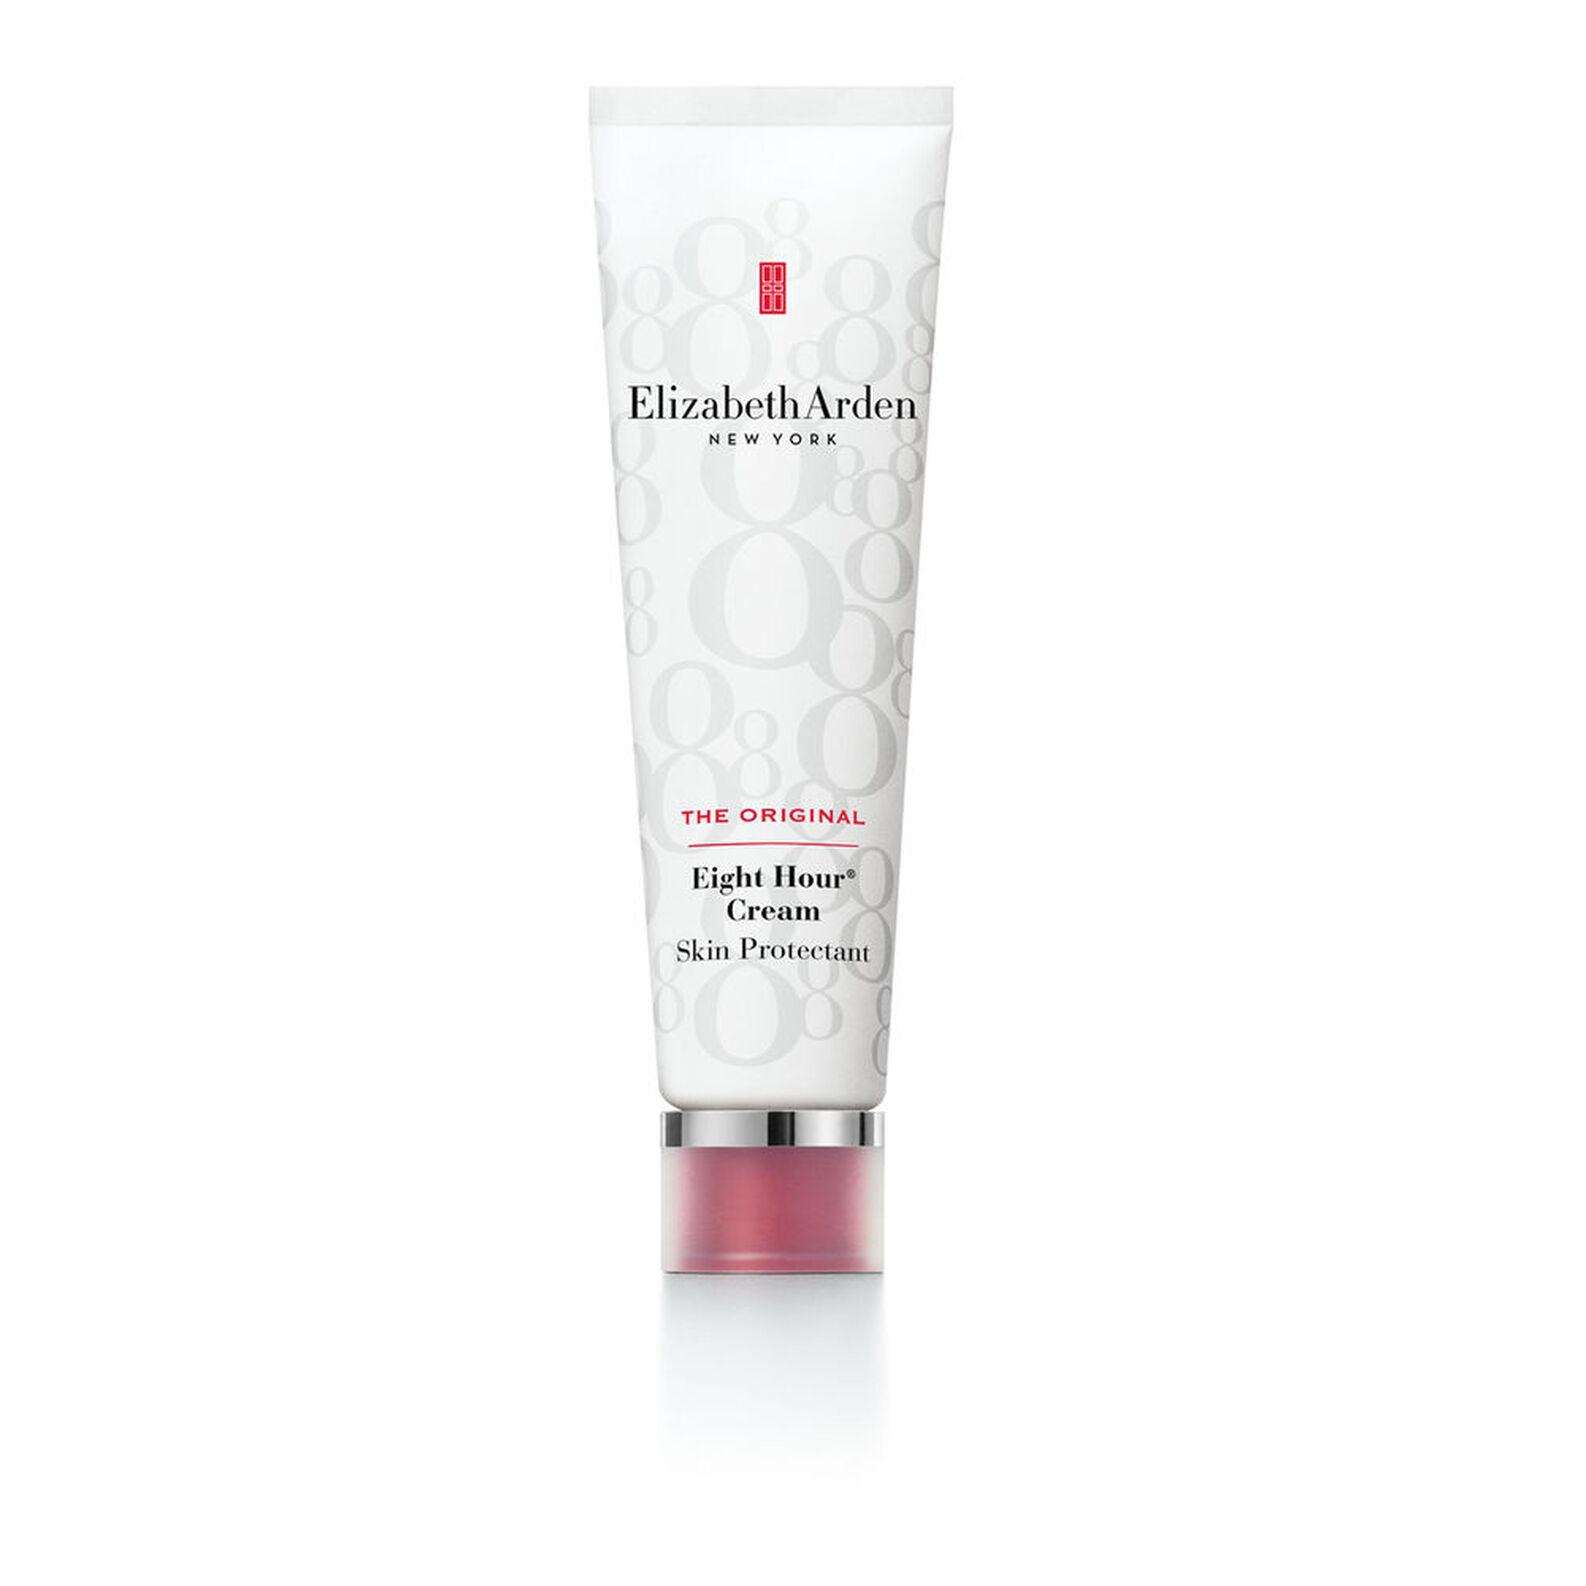 Eight Hour Cream Skin Protectant - The Original 50 ml